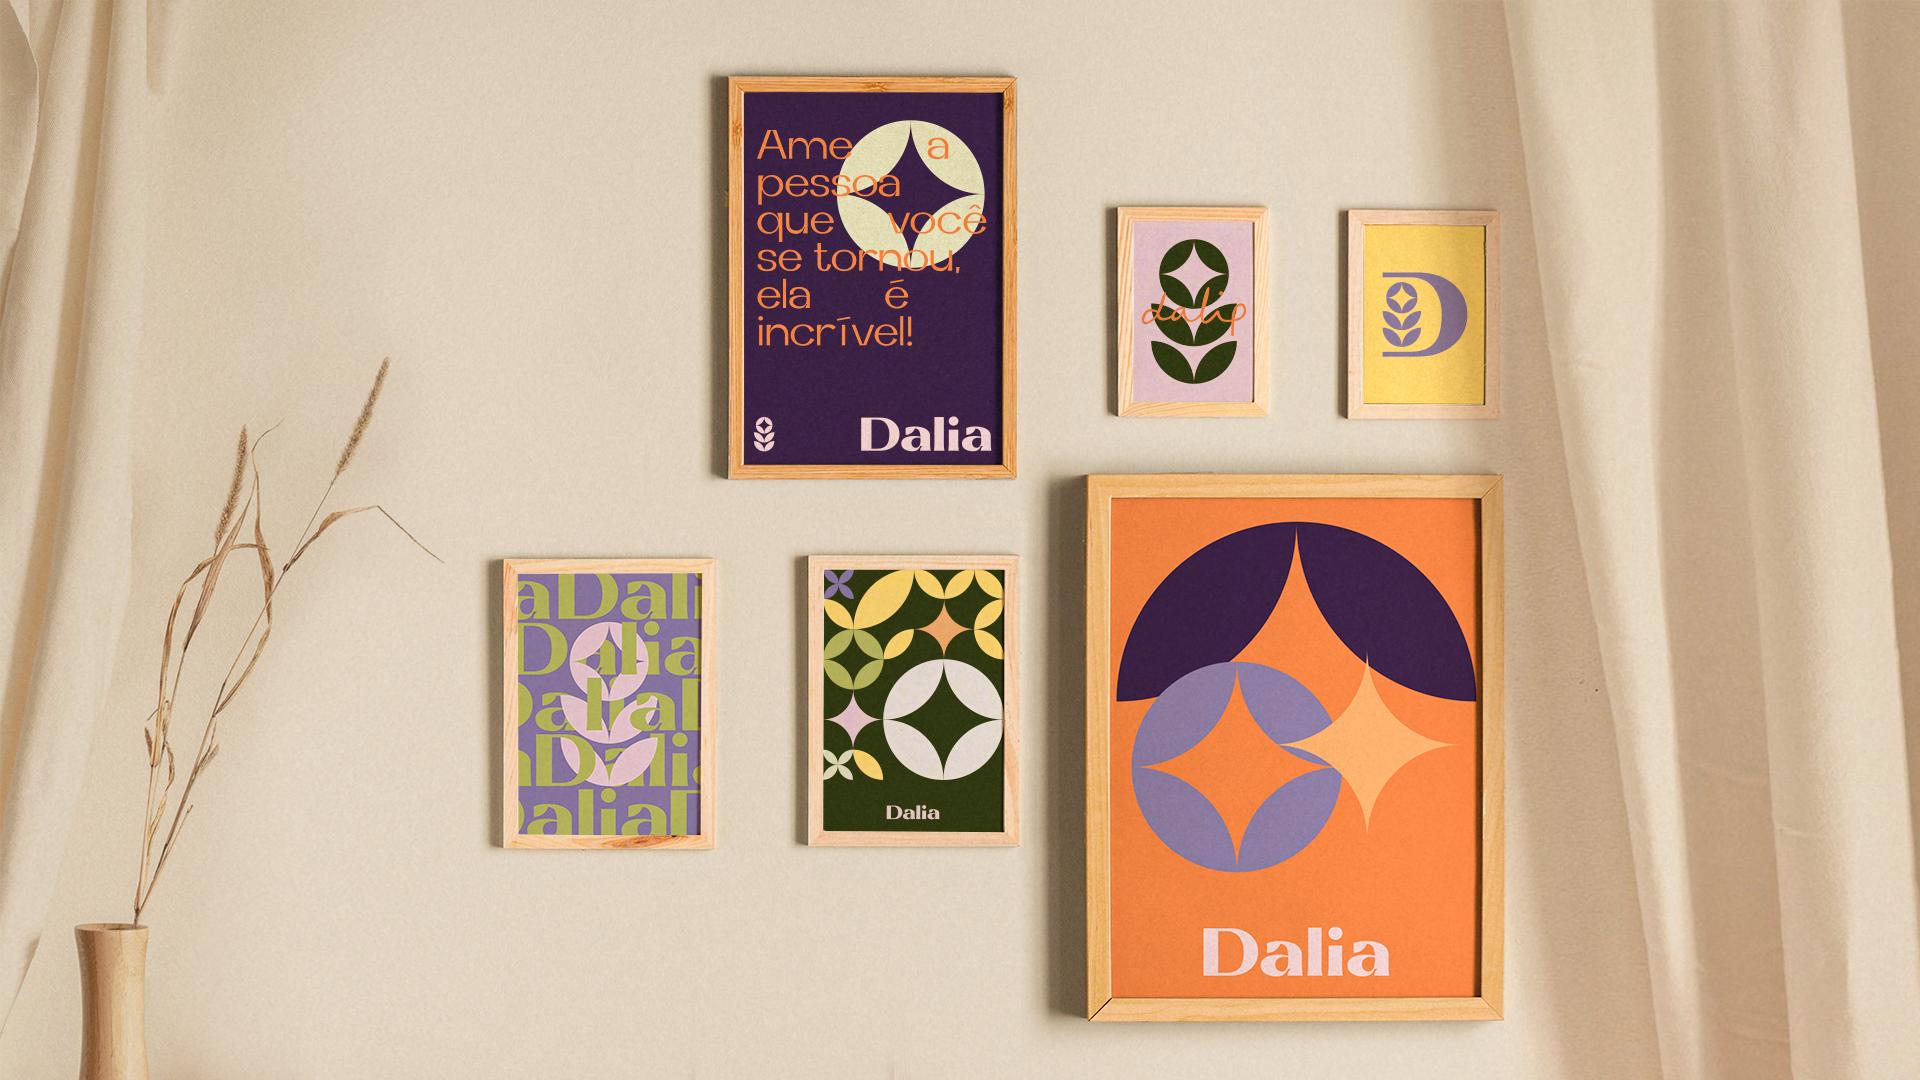 dalia_posters_03.png